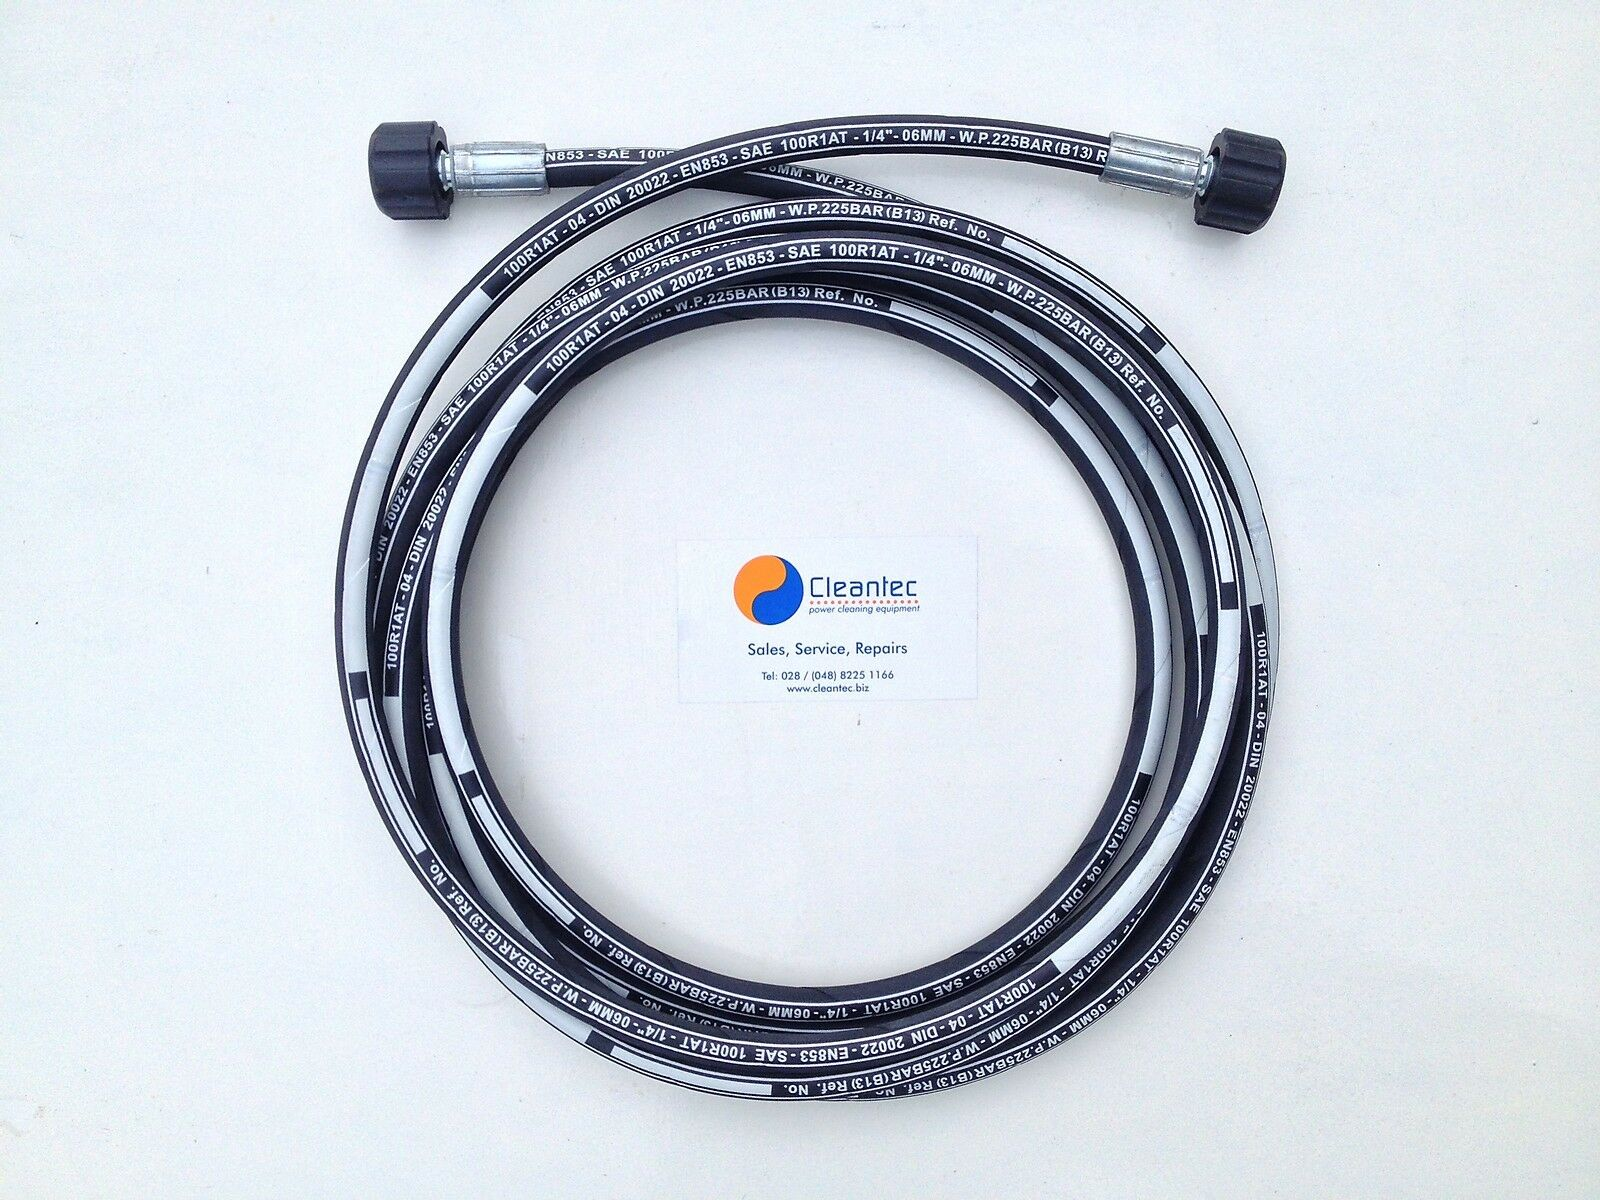 25 25 25 Mètre Ryobi Homelite HPW2400 Nettoyeur Haute Pression Tuyau de Rechange Vingt 4634d7